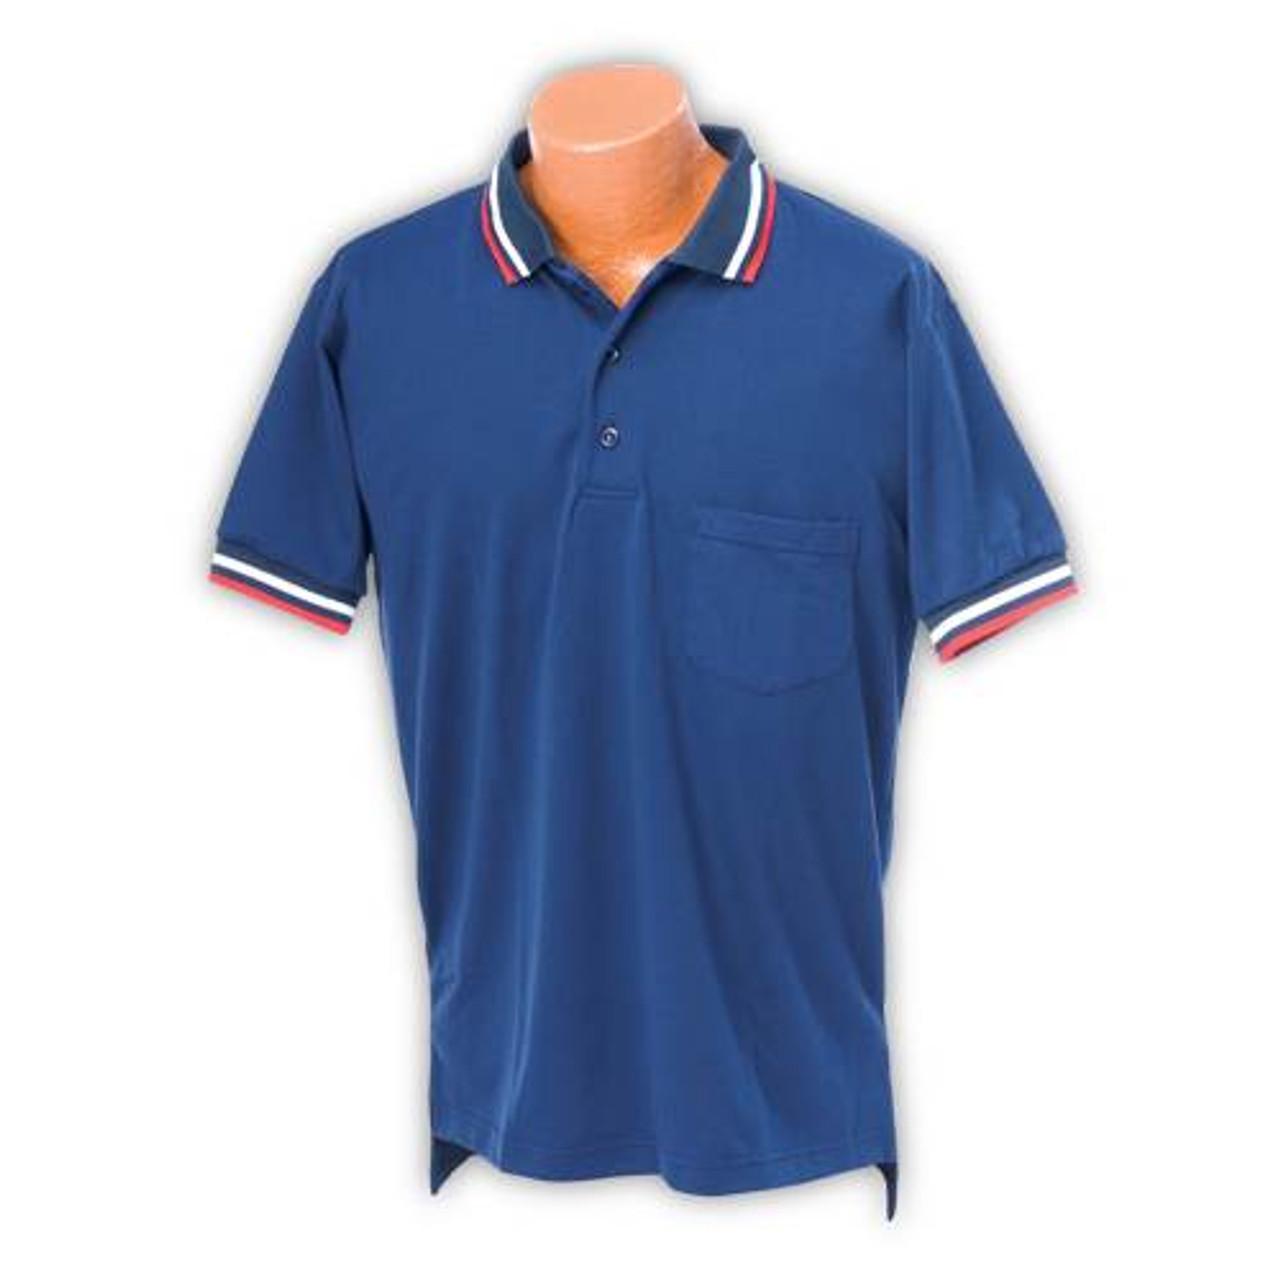 Pro Softball/Baseball Umpire Shirt XXXL